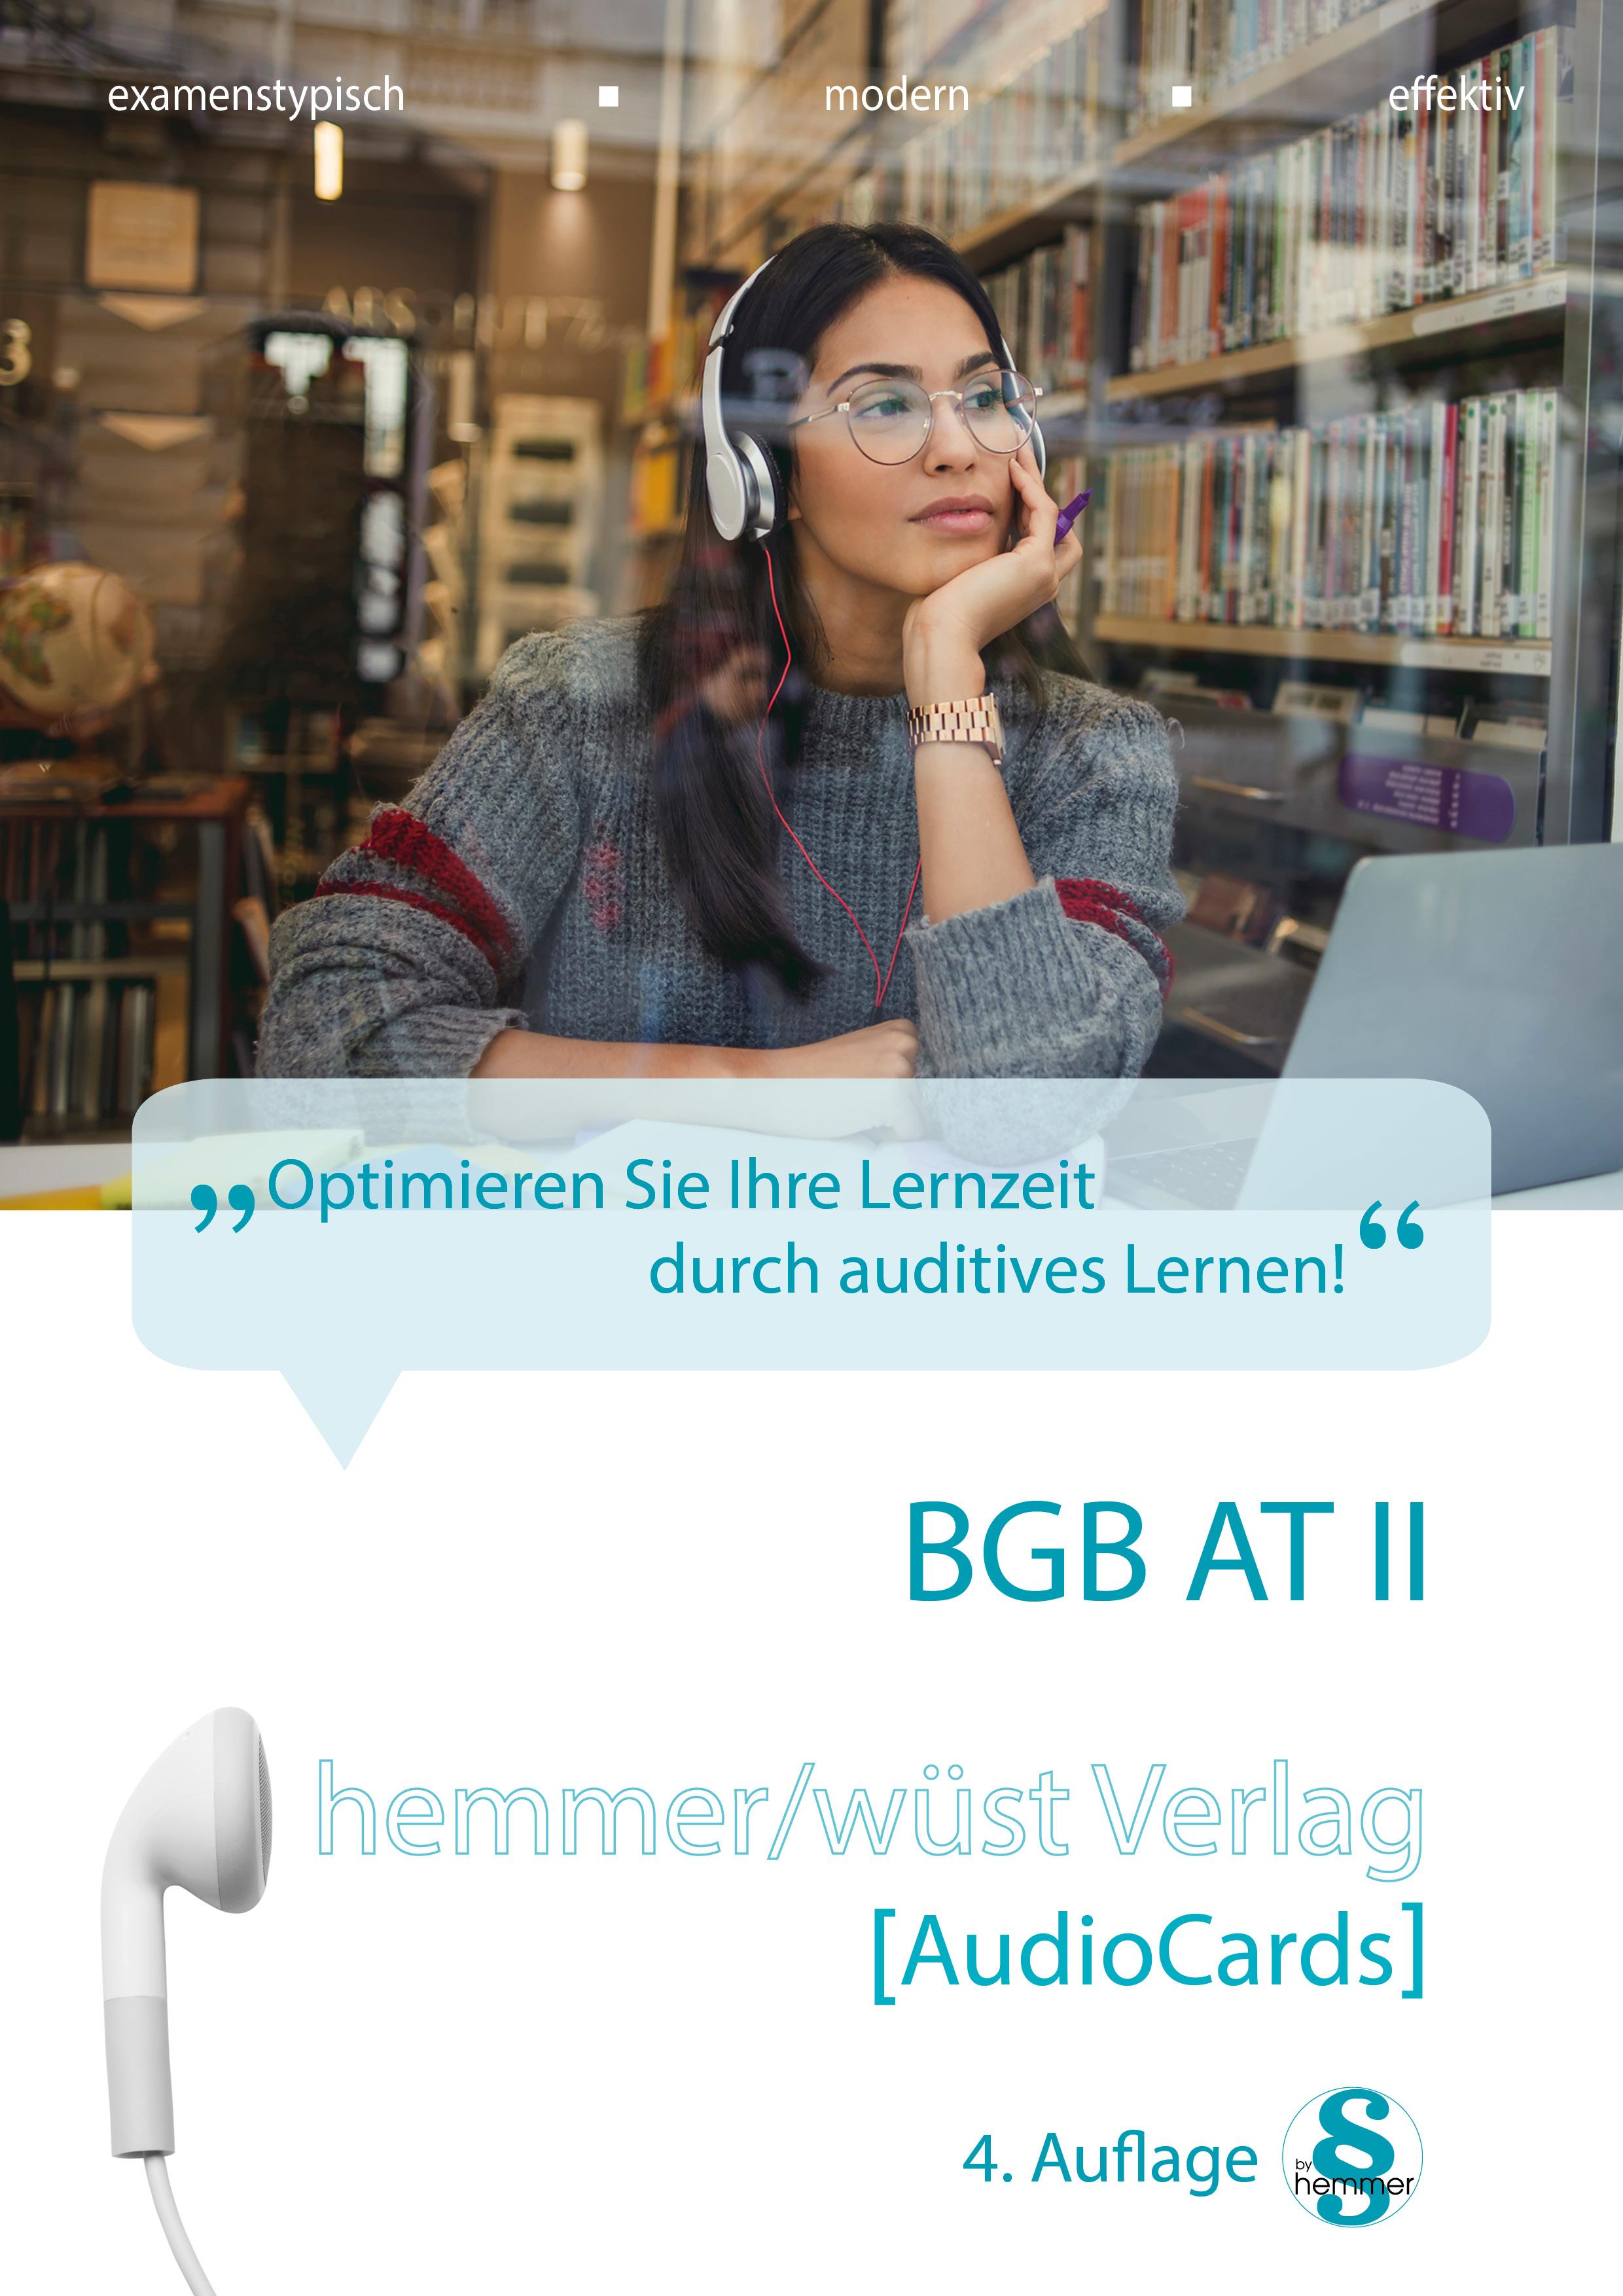 Audiocards - BGB AT II - Download